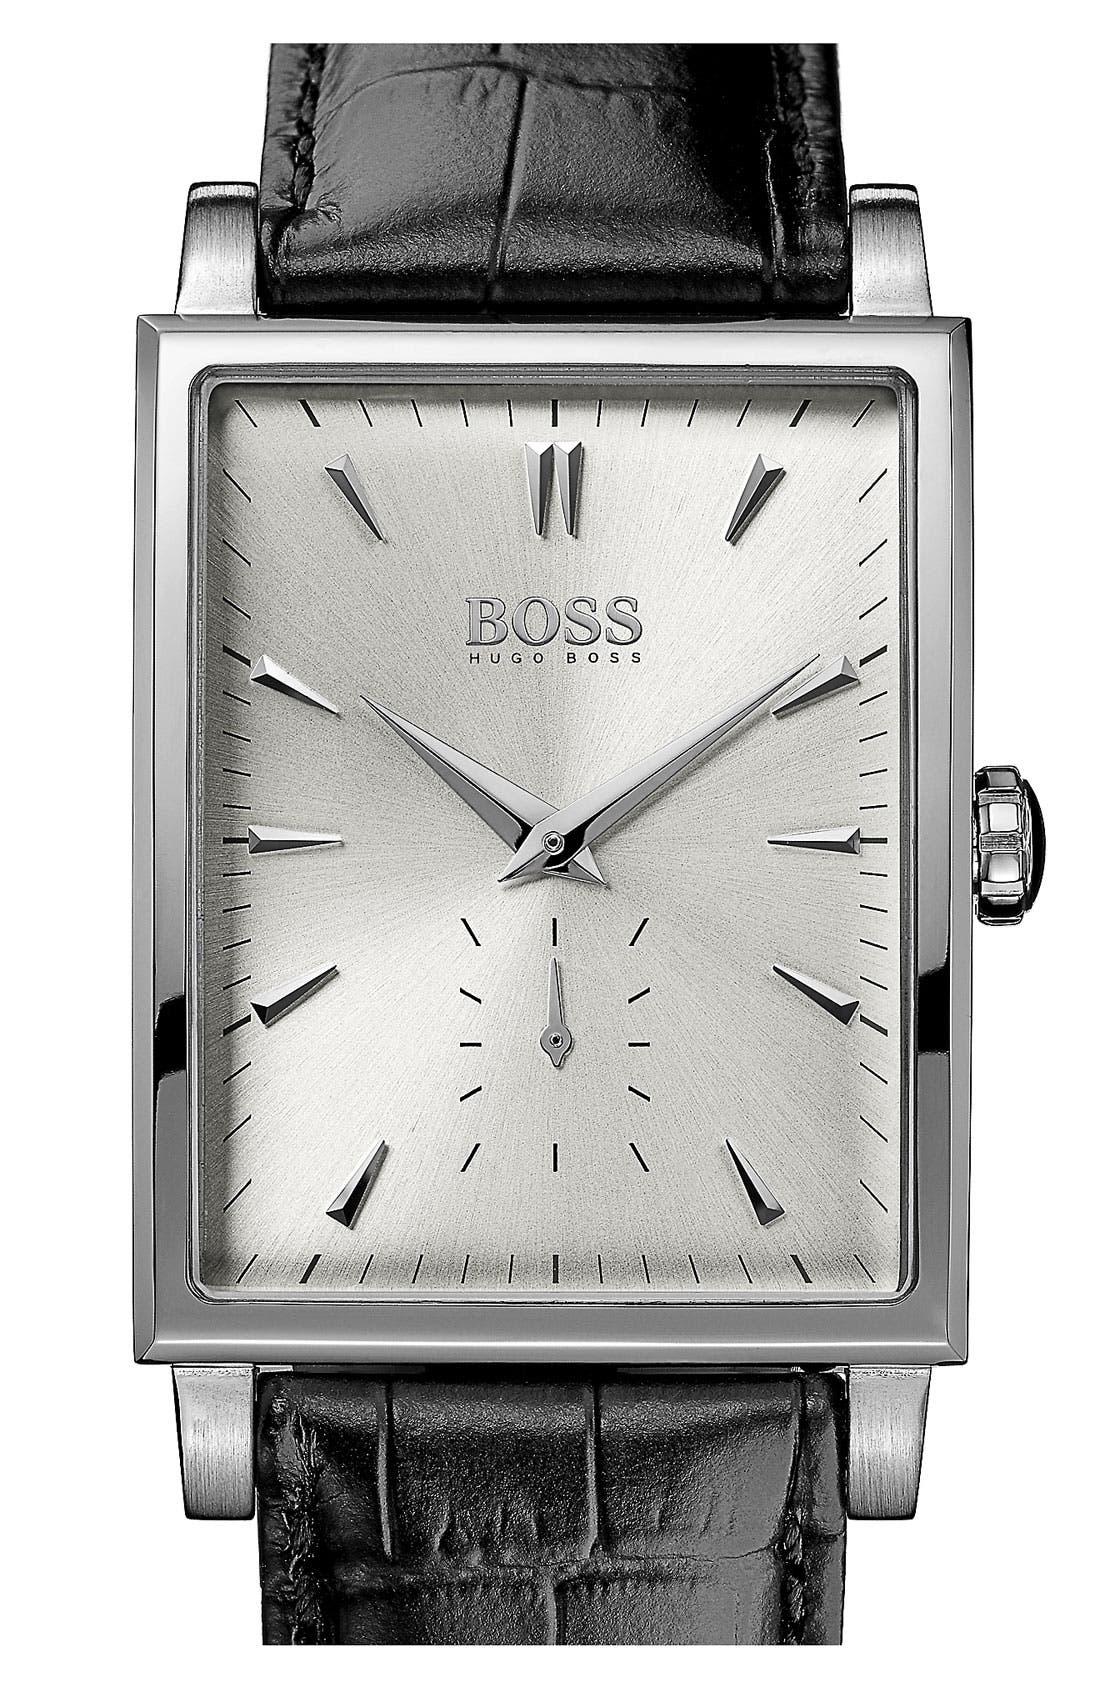 Main Image - BOSS HUGO BOSS Rectangular Leather Strap Watch, 31mm x 39mm